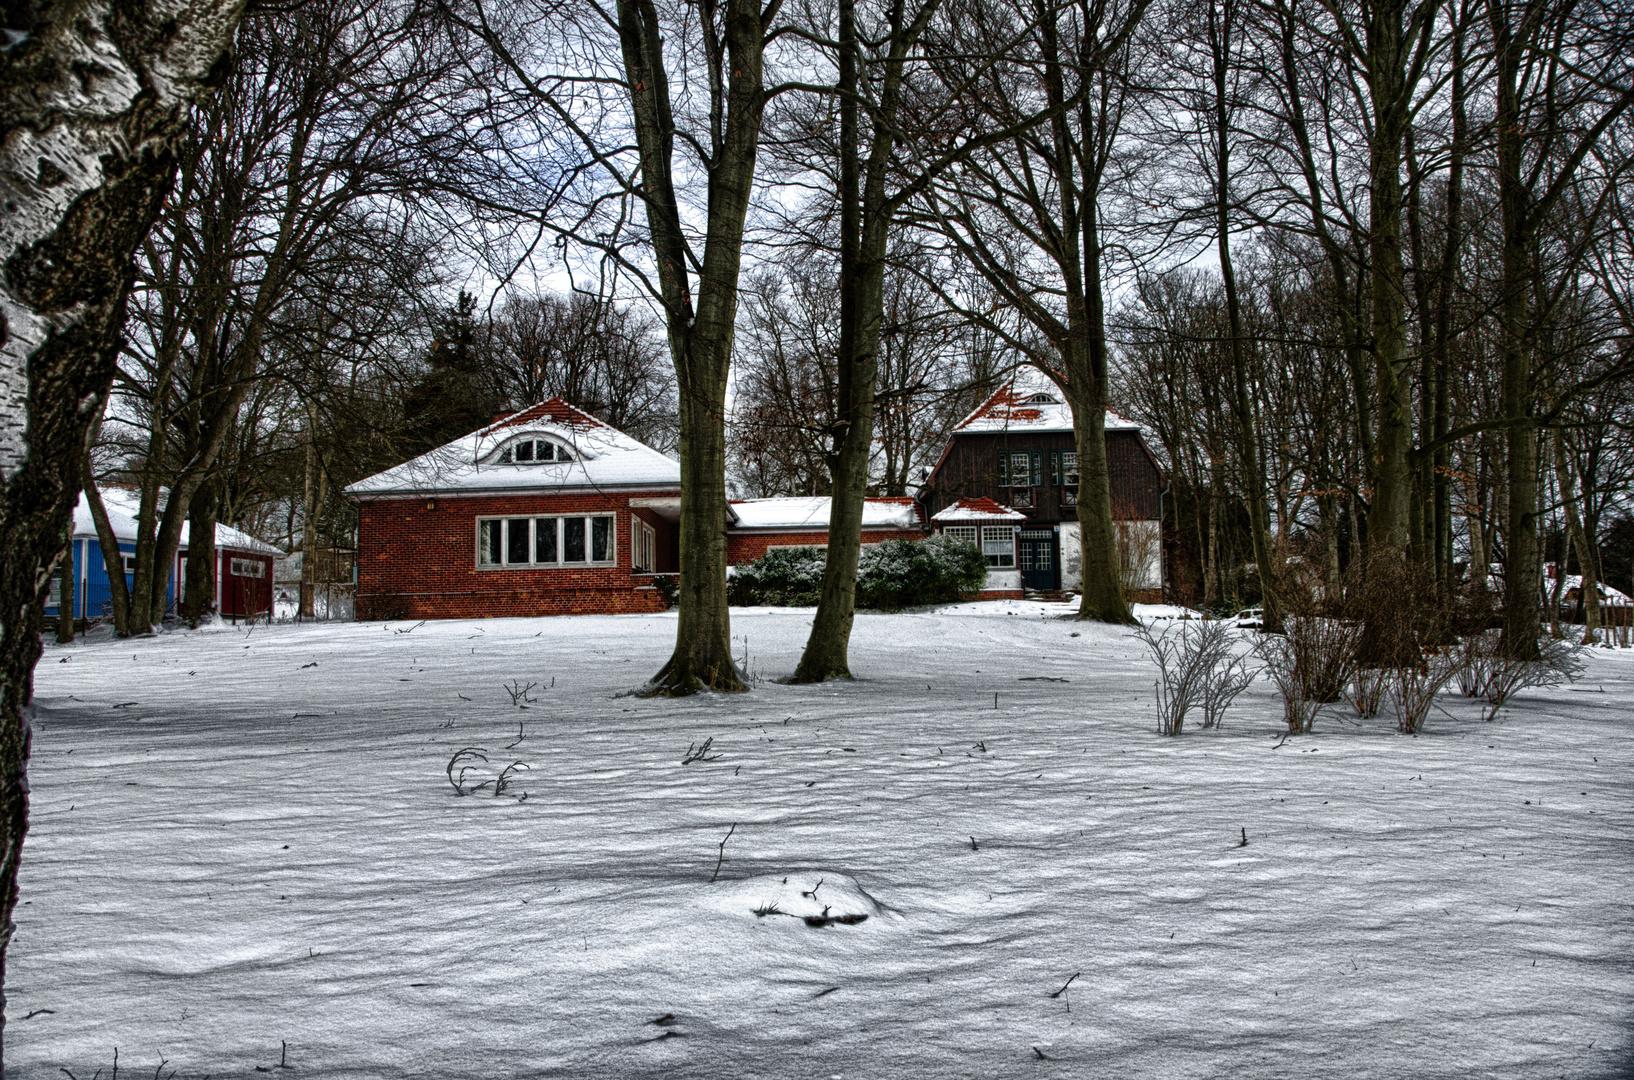 Gerhart Hauptmann Haus in Kloster